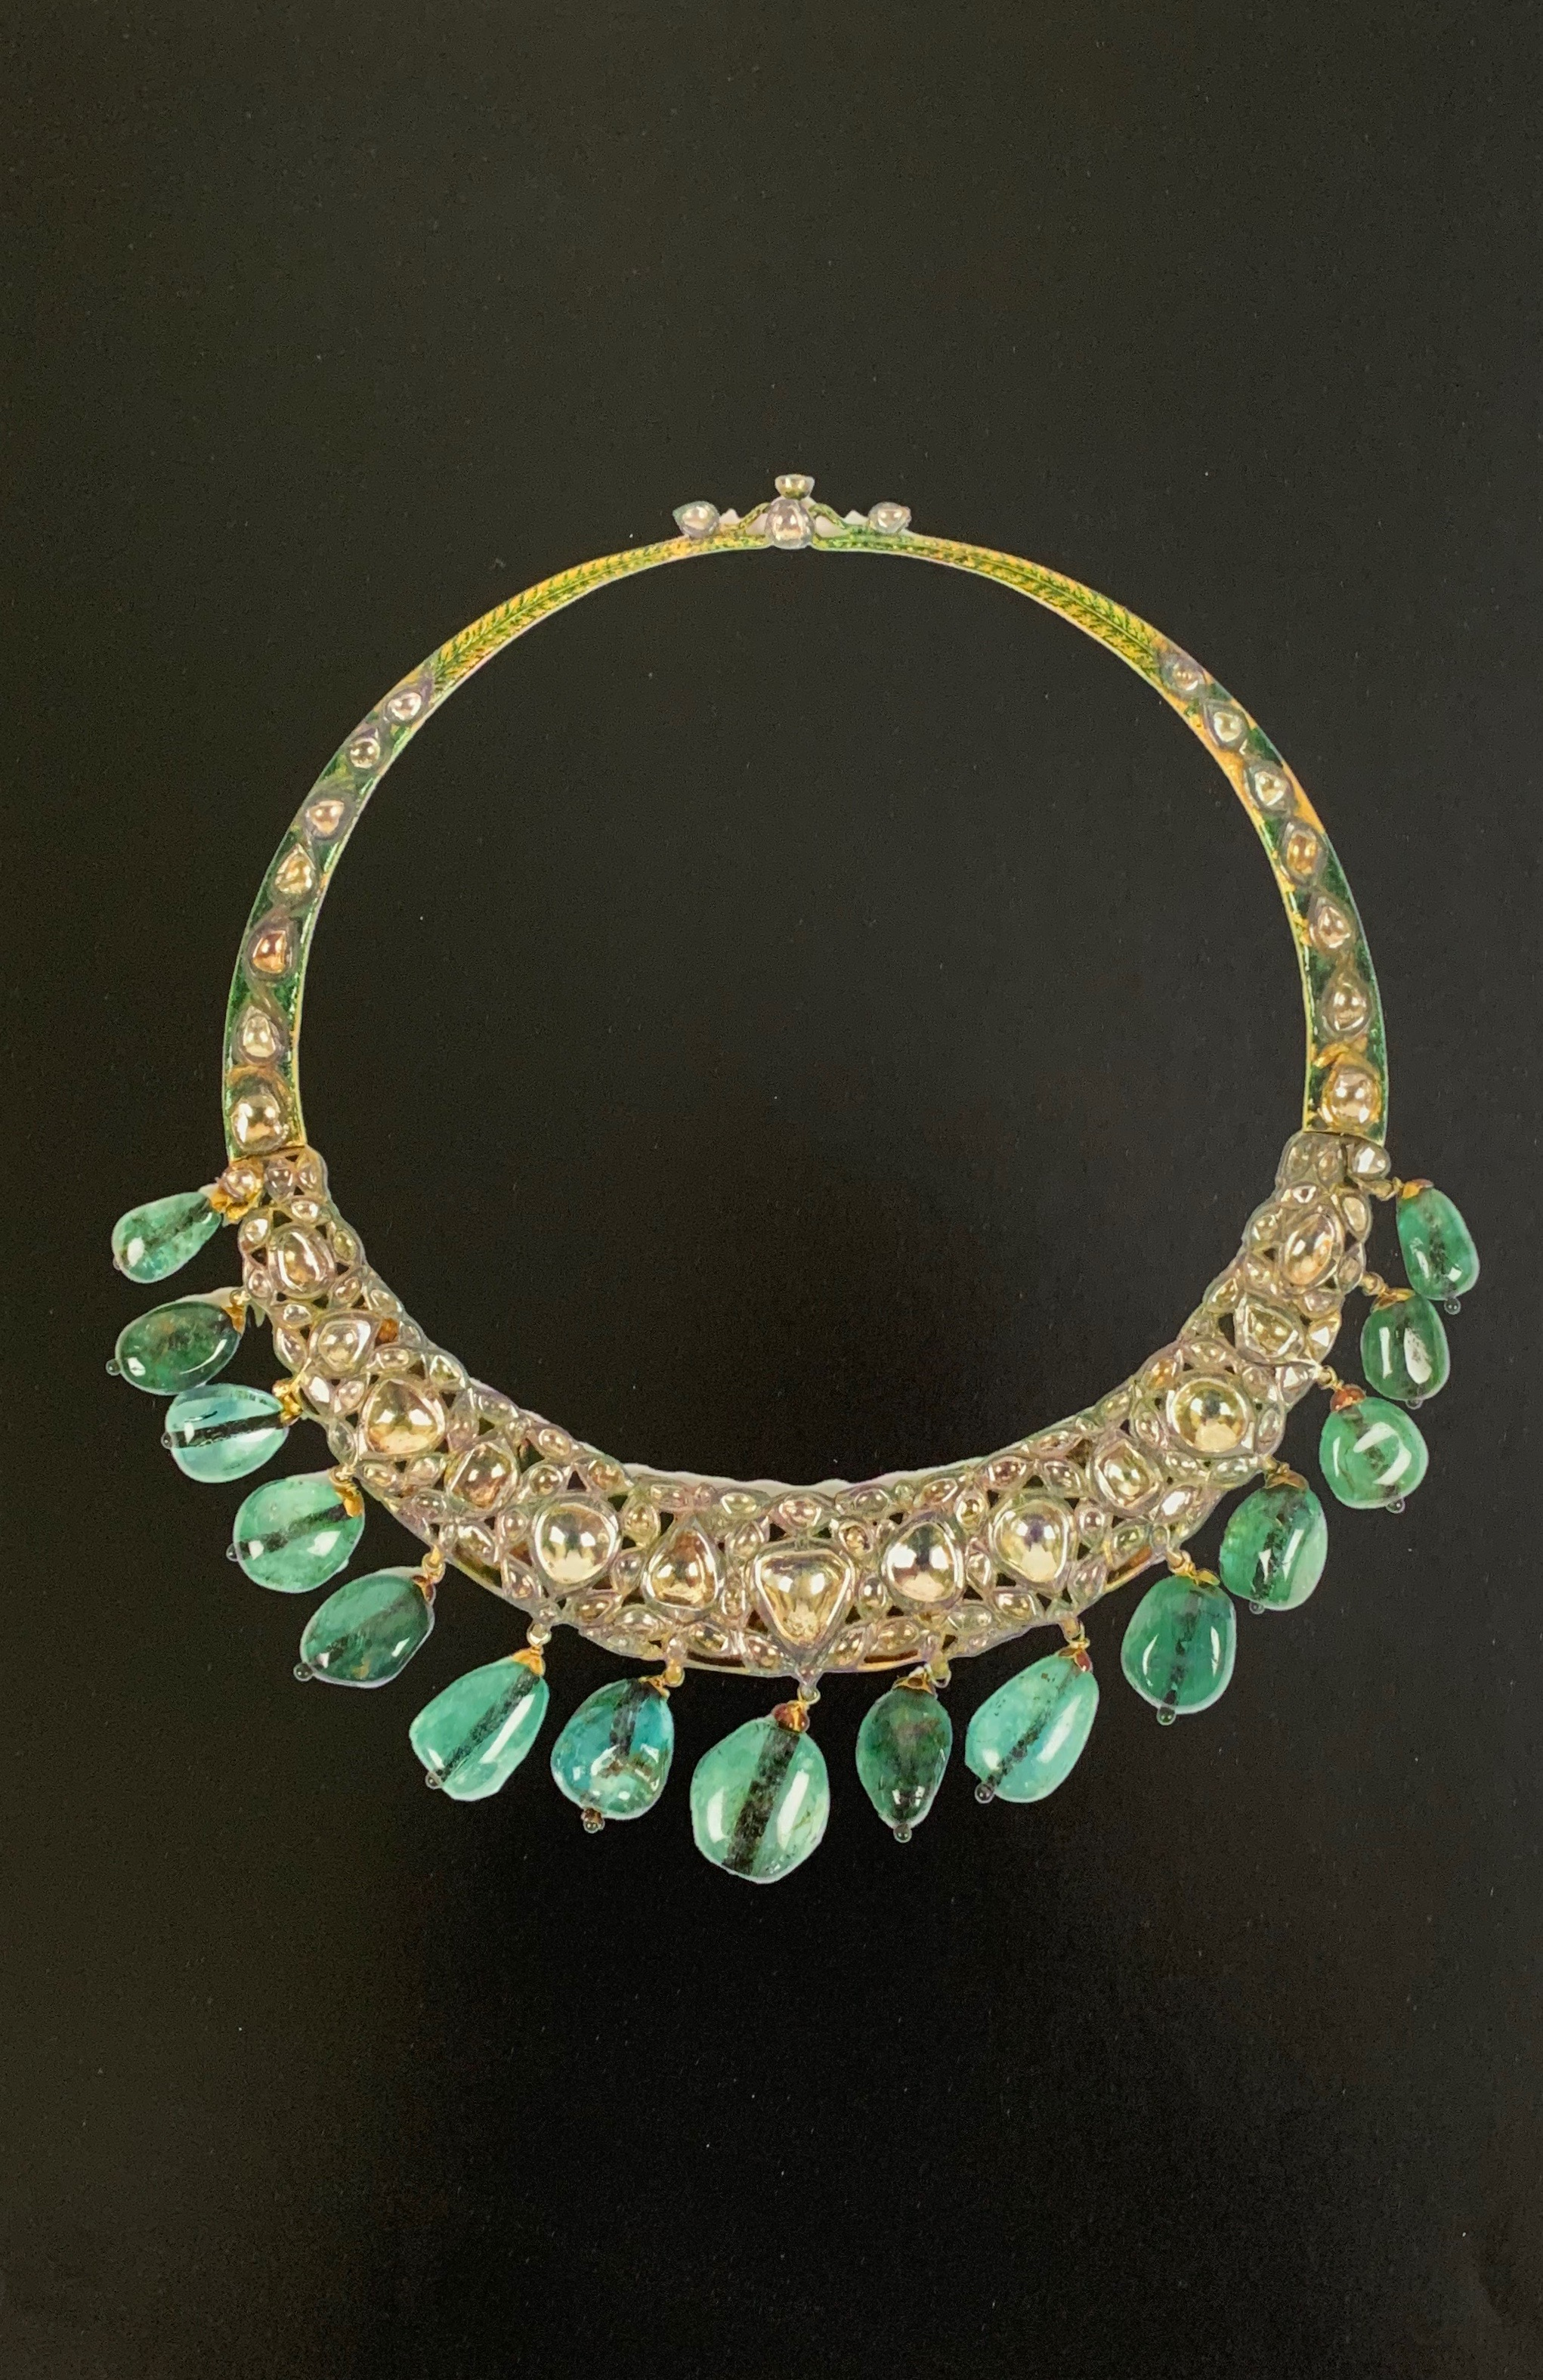 Hansli Parab Mai Aweeza Zamarrud -- Gold necklace set with diamonds and emerald drops